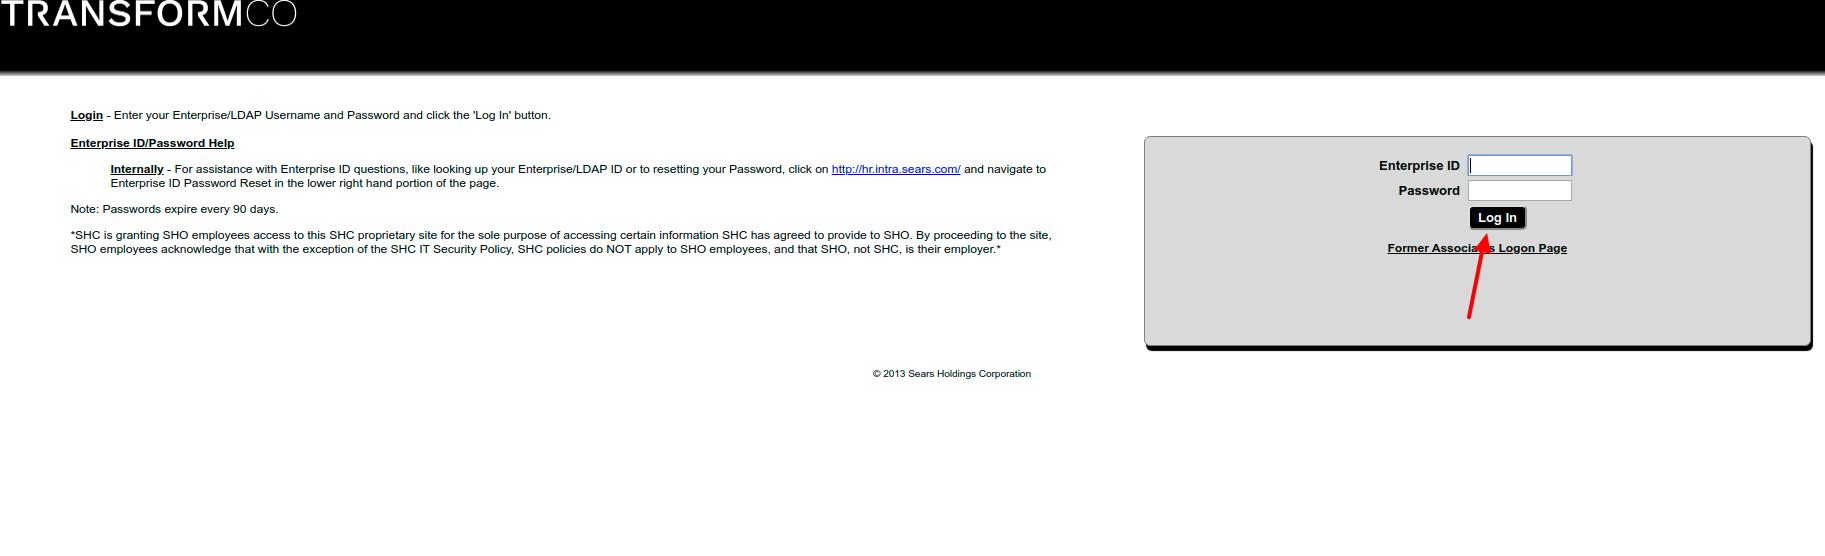 Associate Online Services Logon